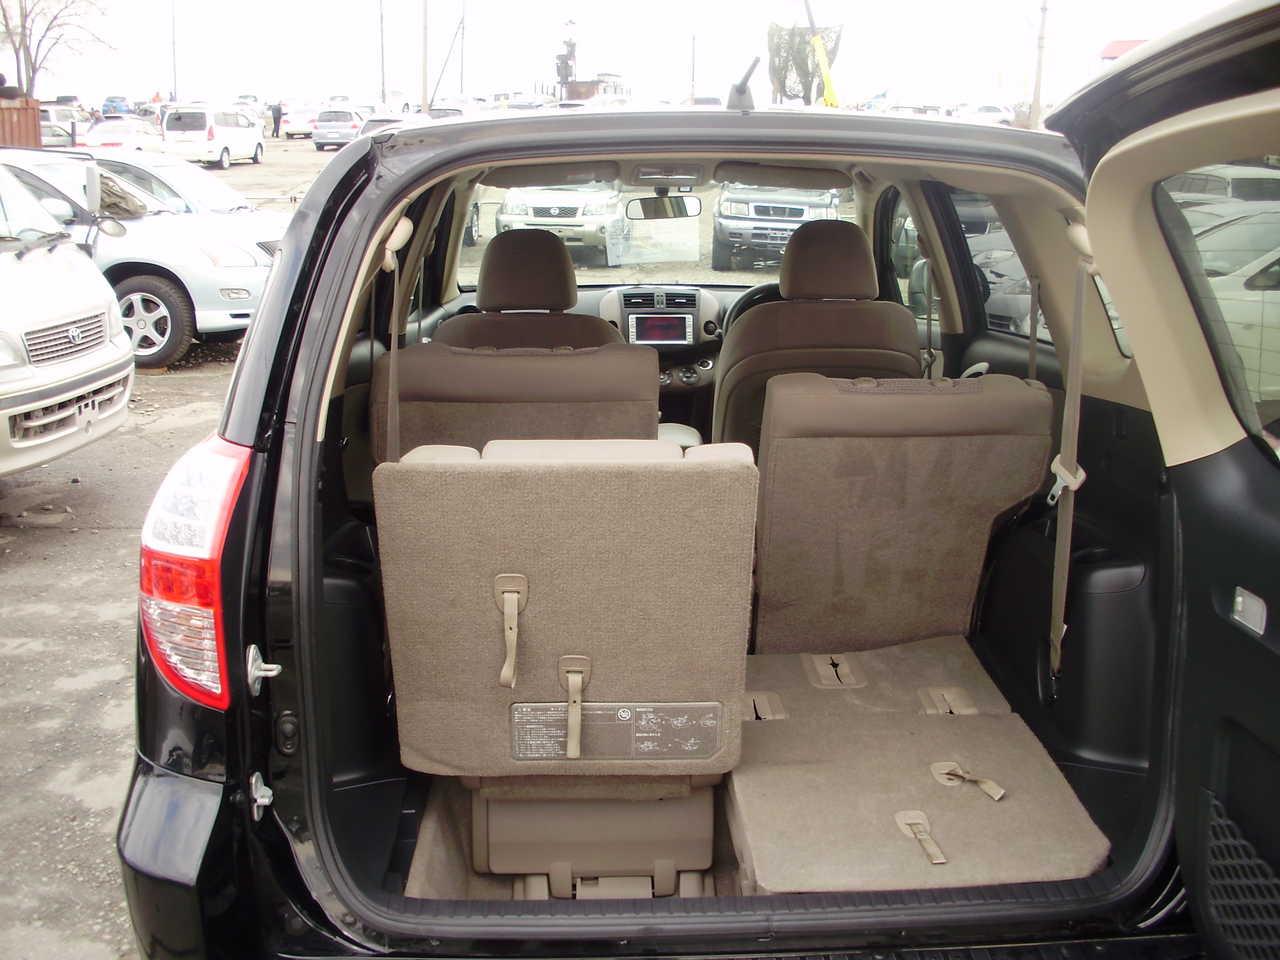 2008 Toyota Vanguard Pictures 2 4l Gasoline Automatic